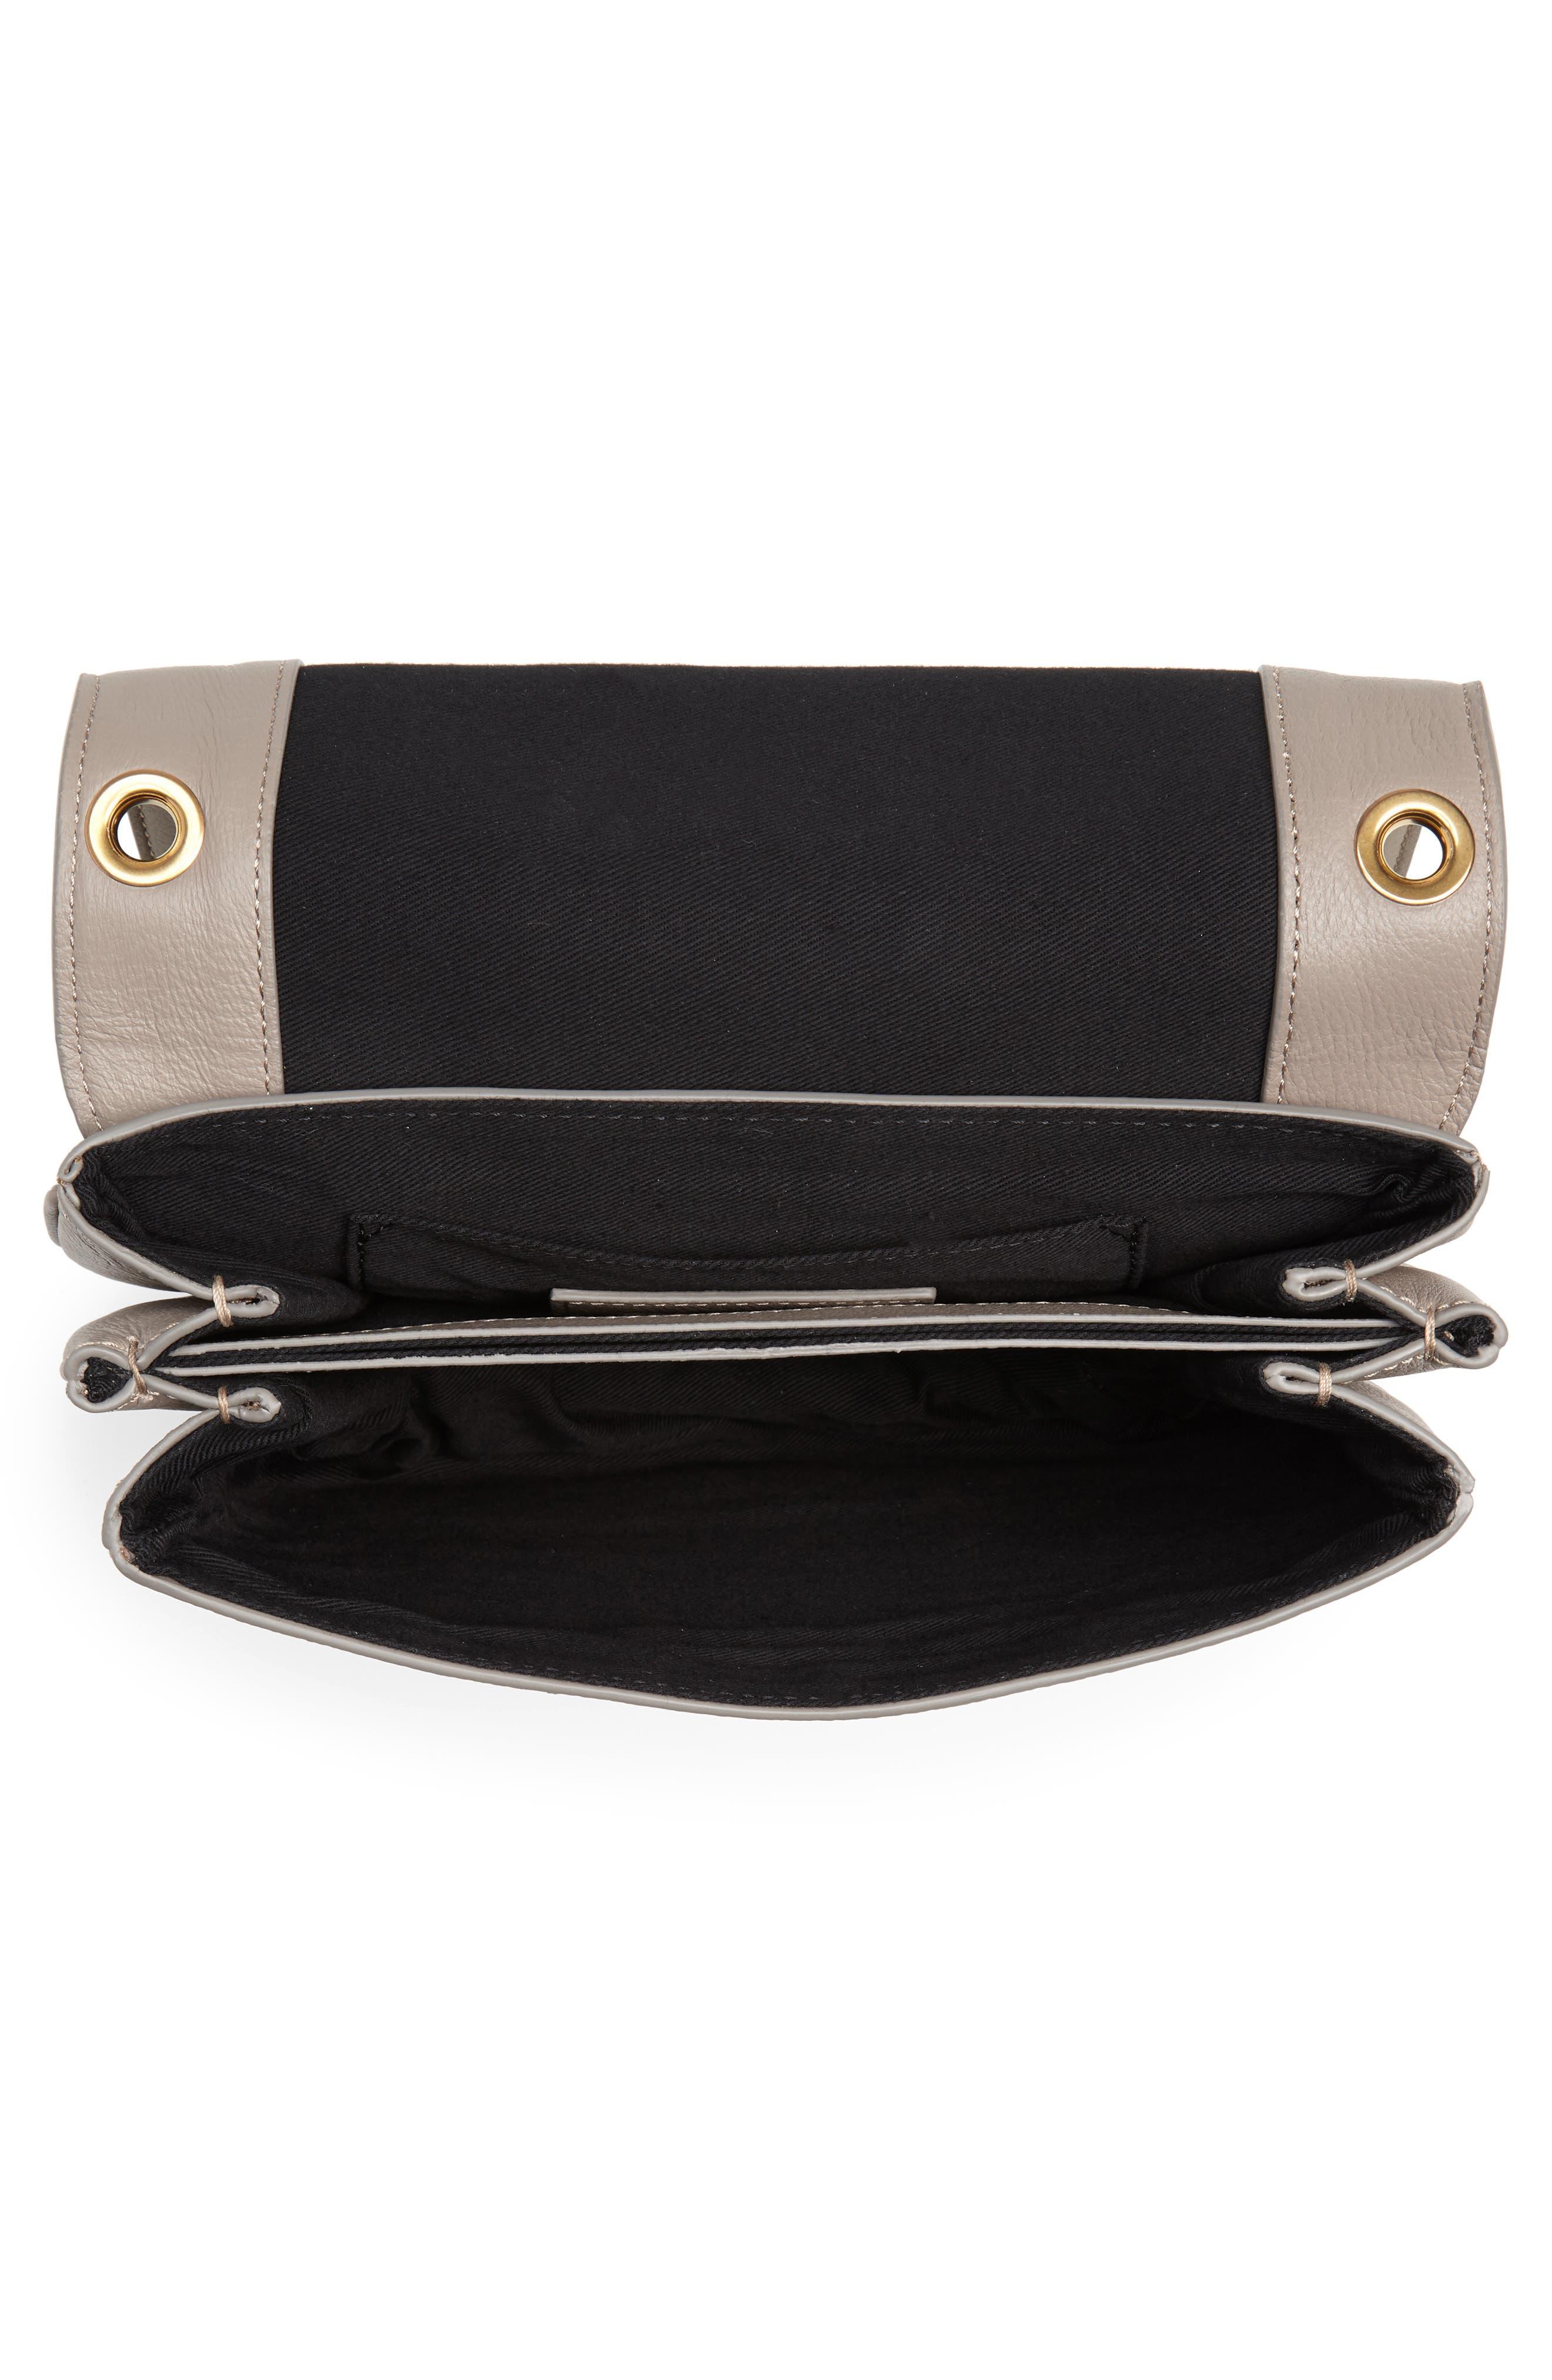 Hana Small Leather Crossbody Bag,                             Alternate thumbnail 4, color,                             Motty Grey